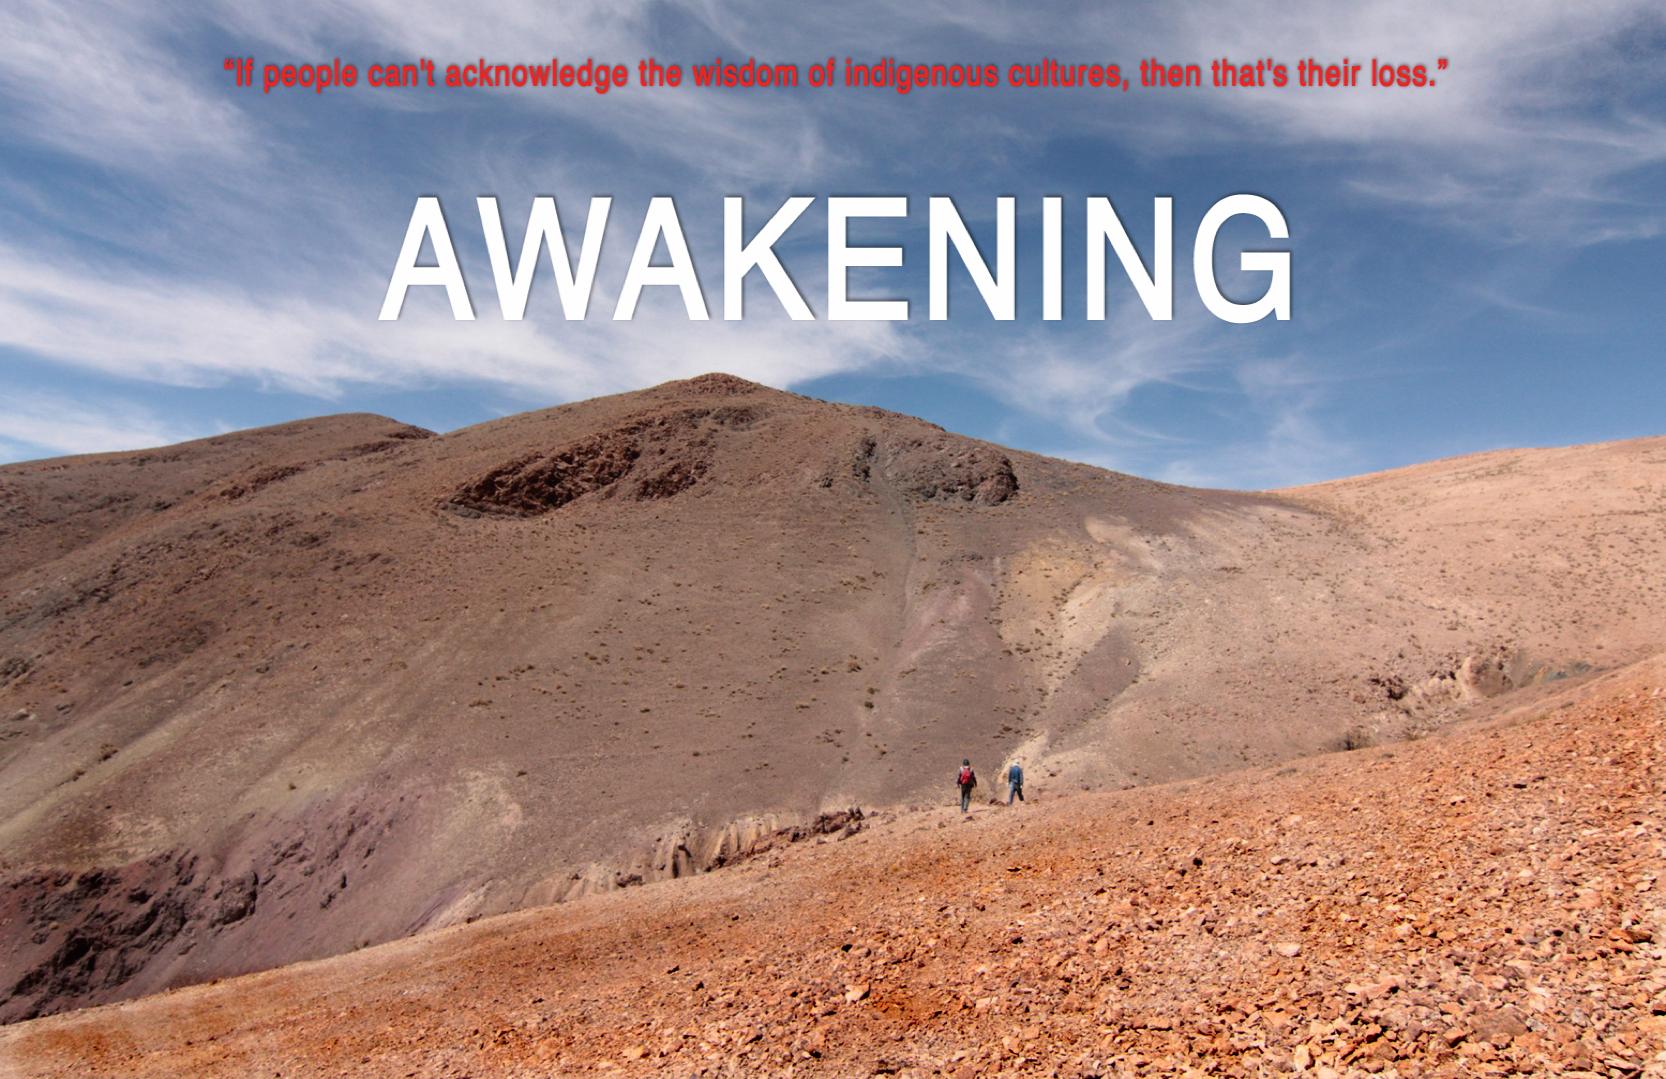 awakening_4x3